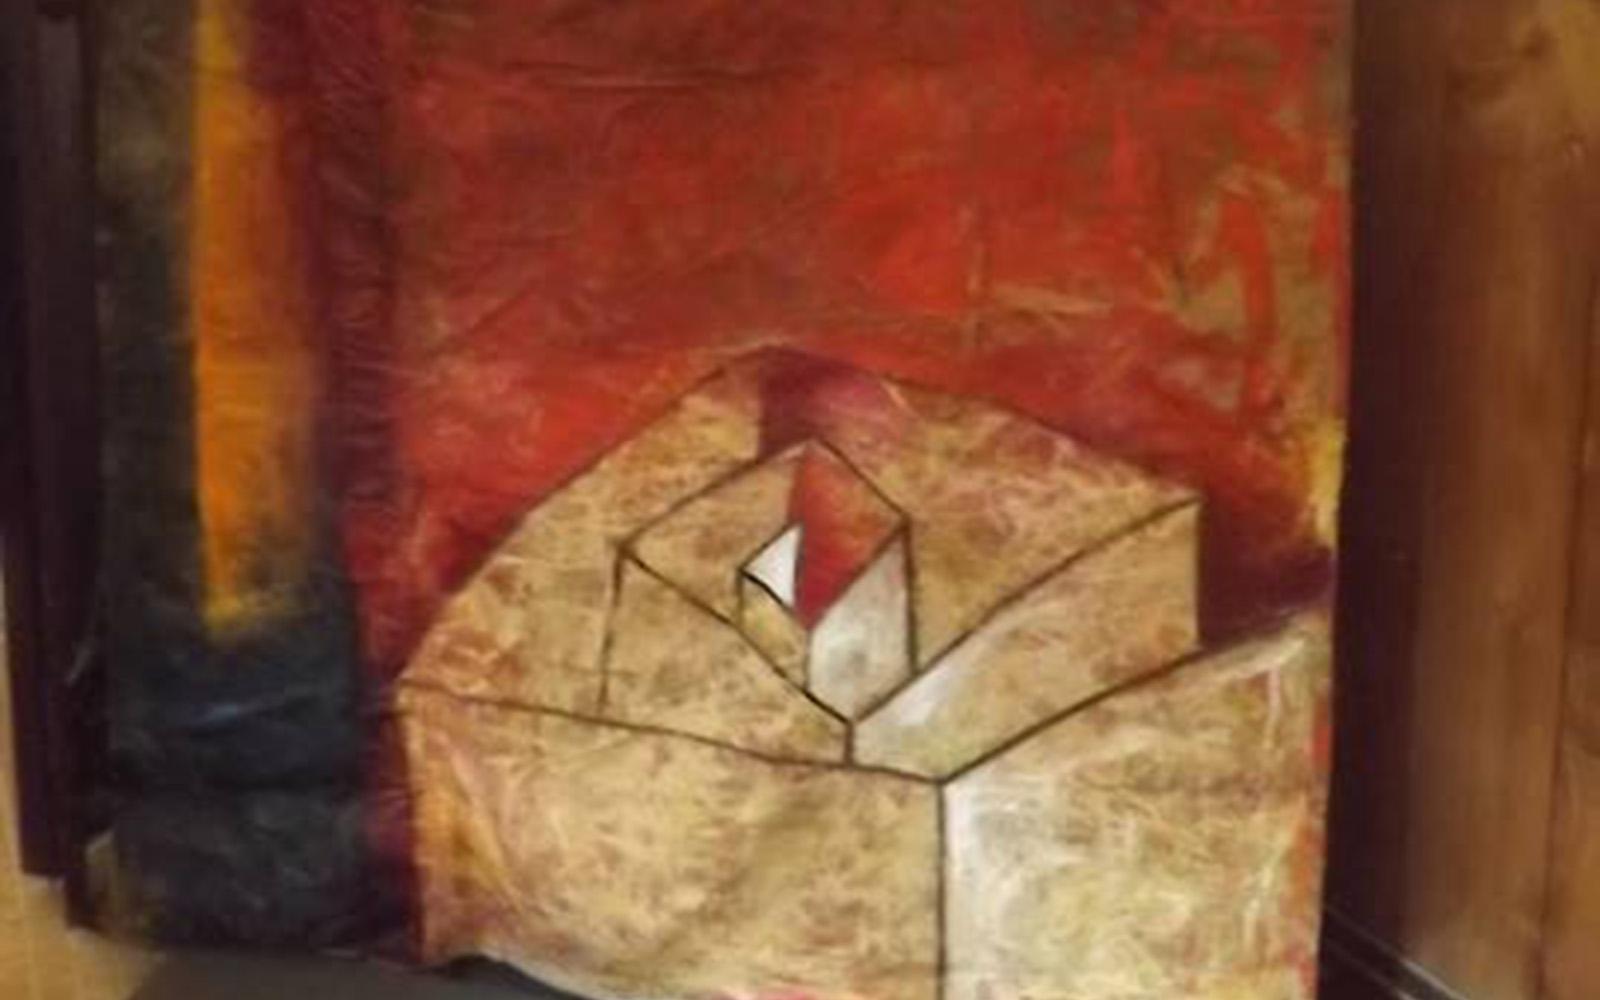 Stunning Vetrina Rossa Monza Ideas - Brentwoodseasidecabins.com ...